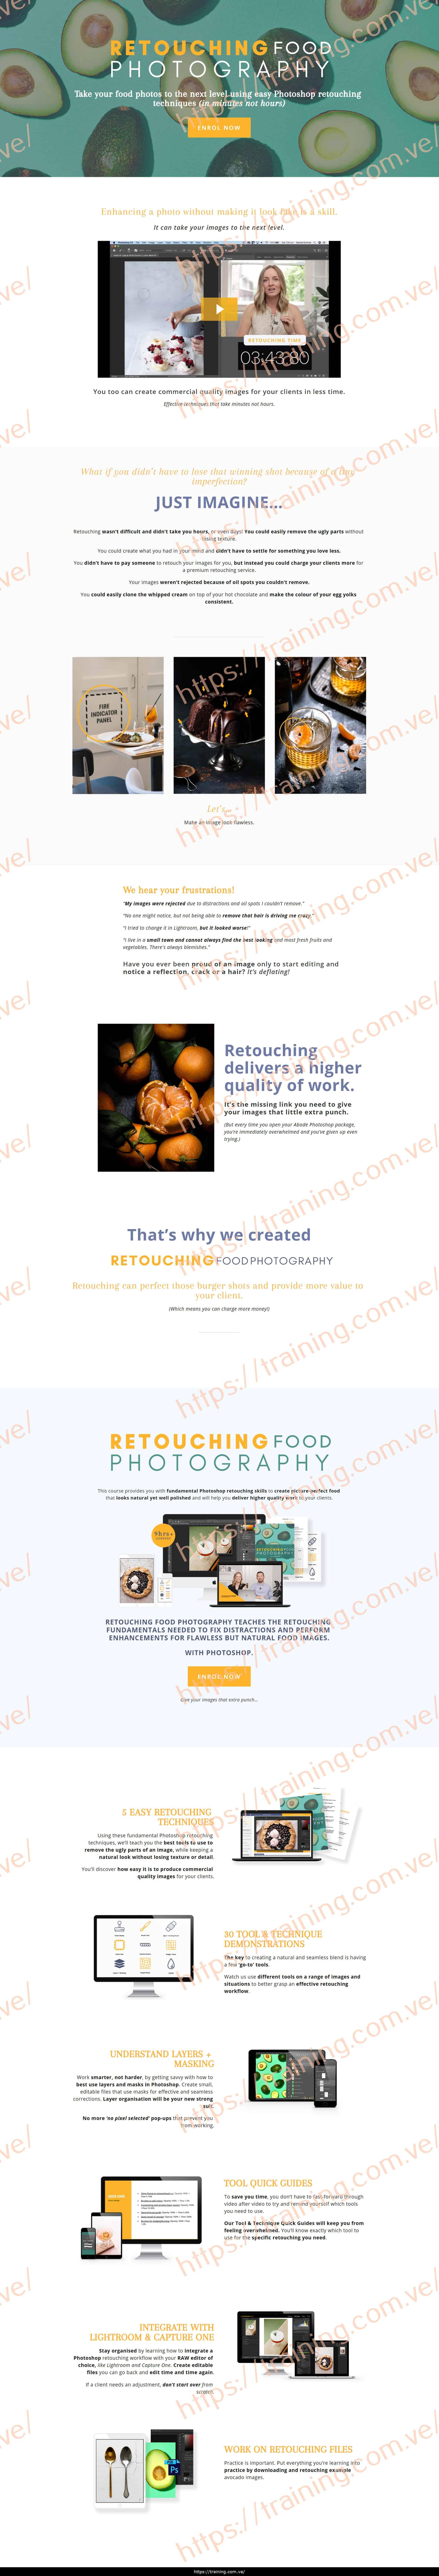 Retouching Food Photography by Rachel + Matt Korinek Sales Page